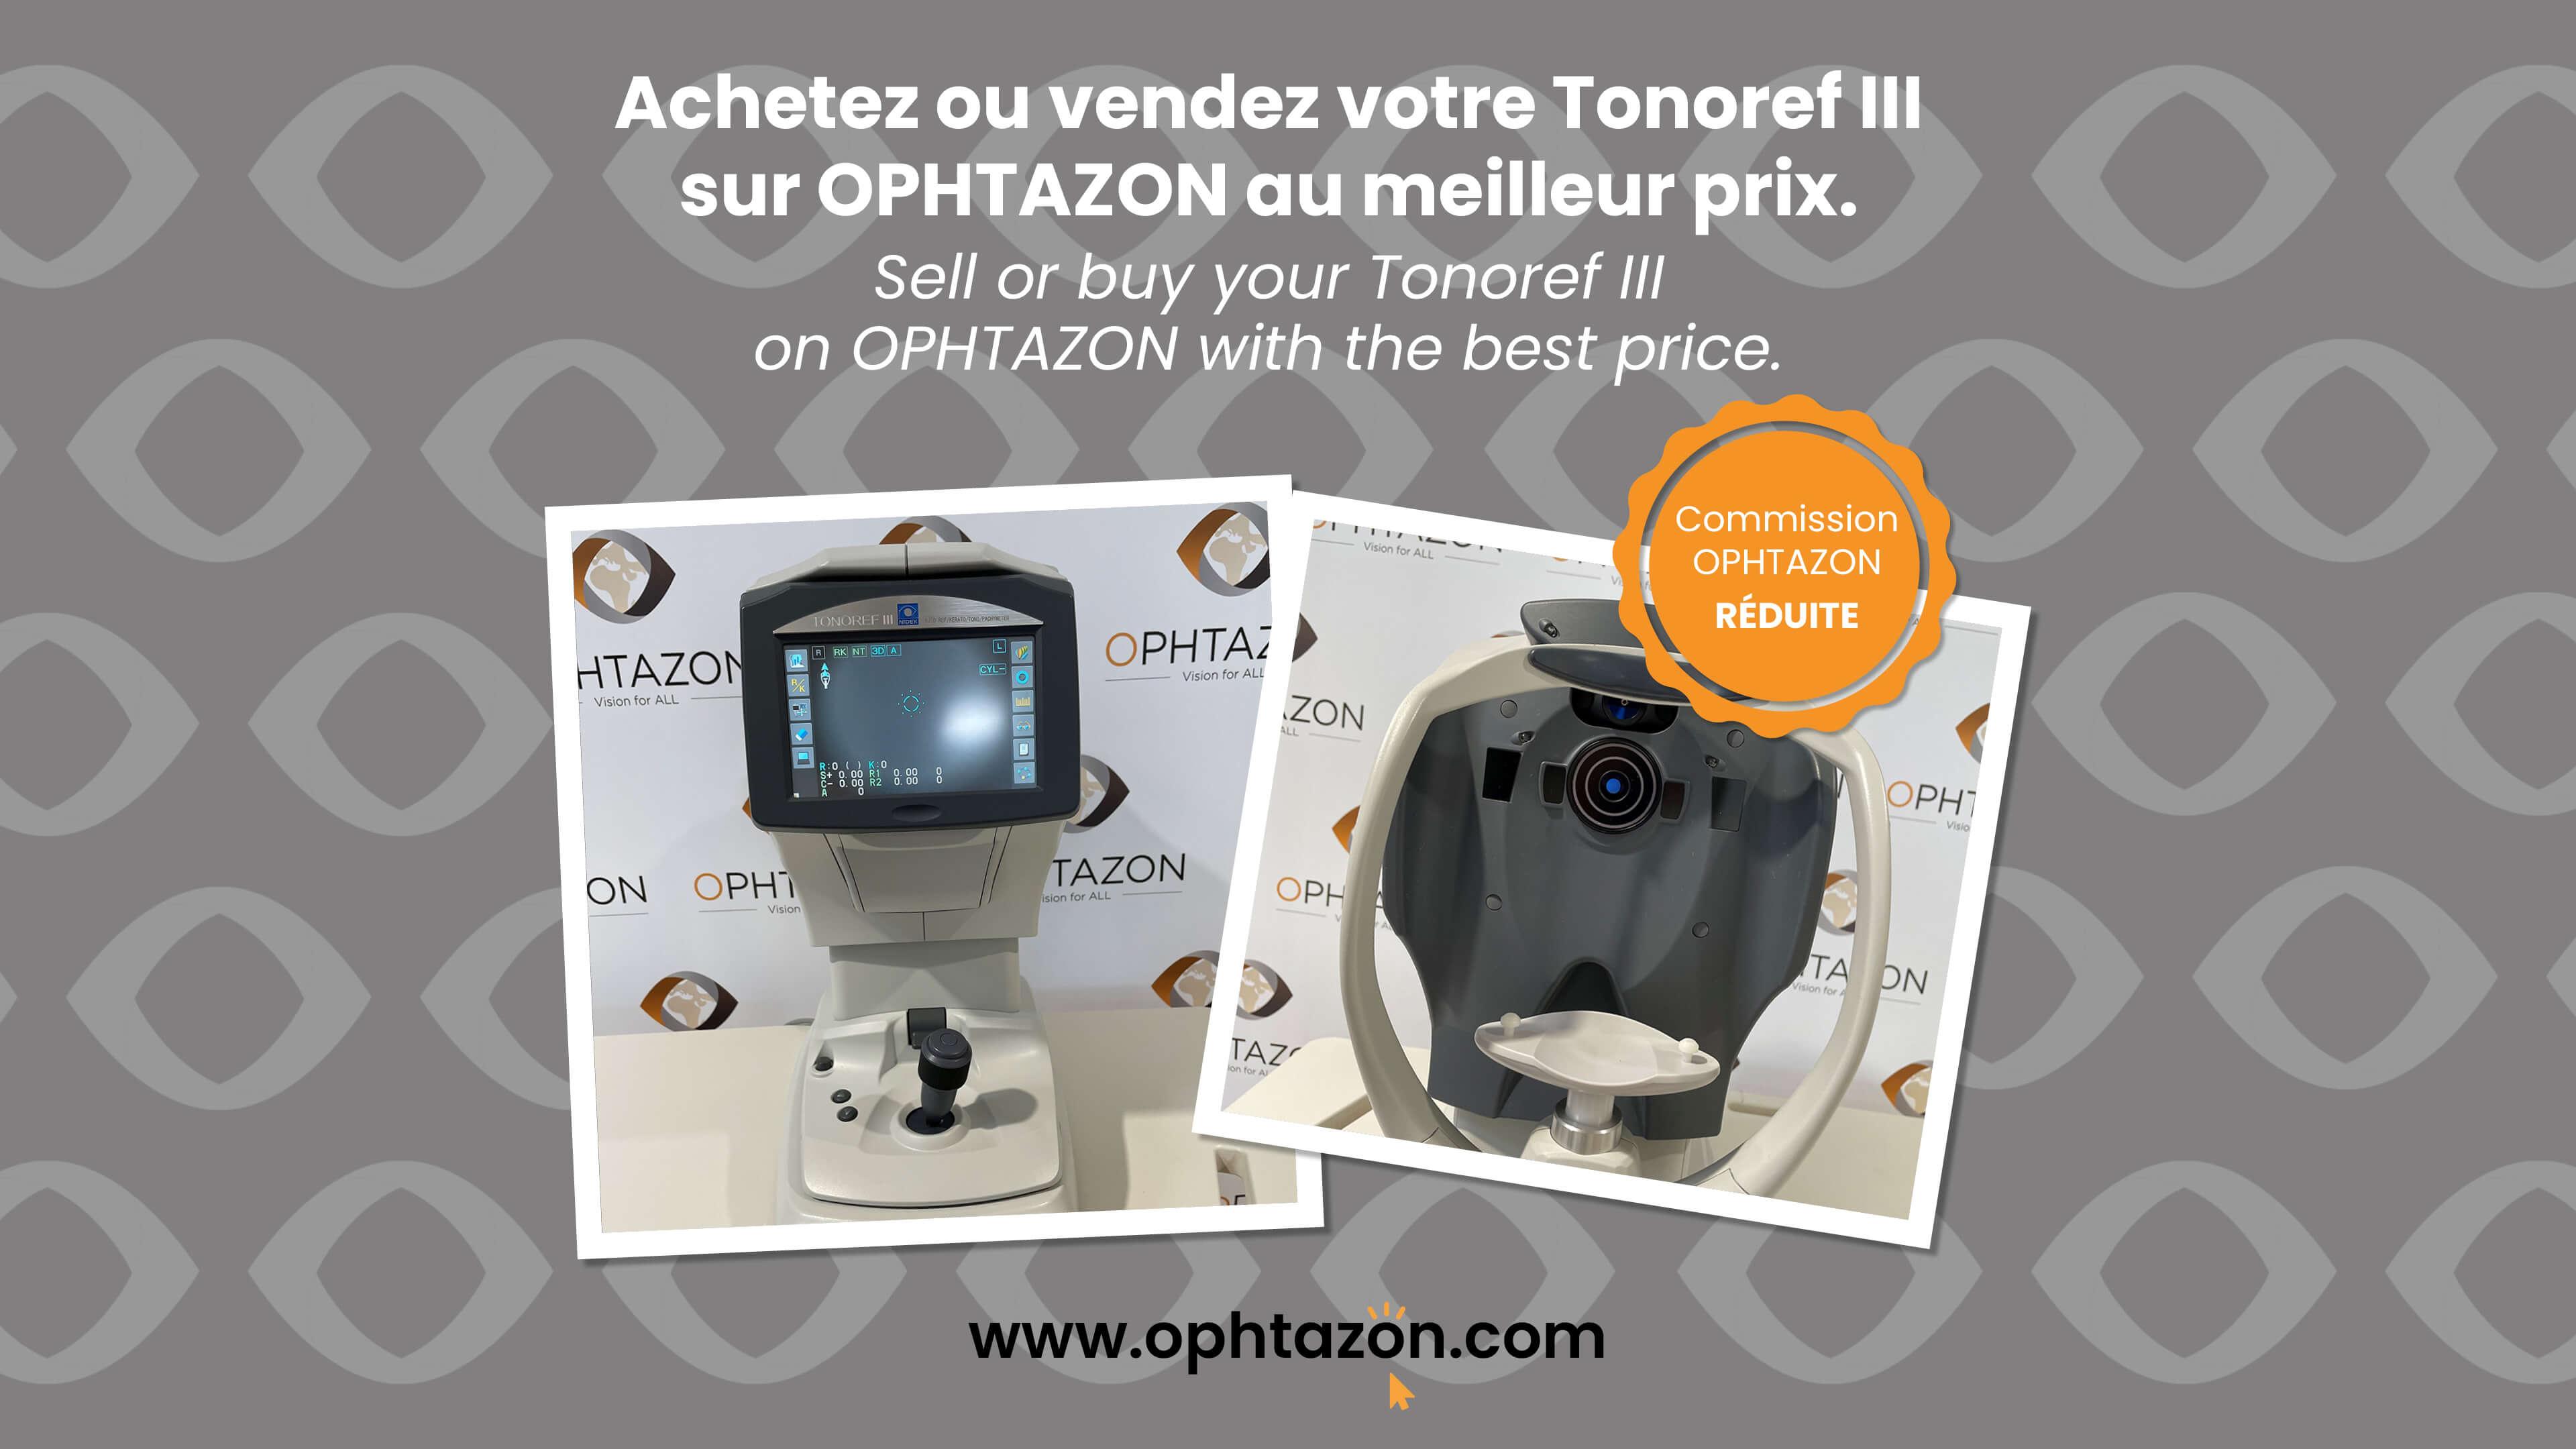 1ère vente d'un Tonoref III Nidek !